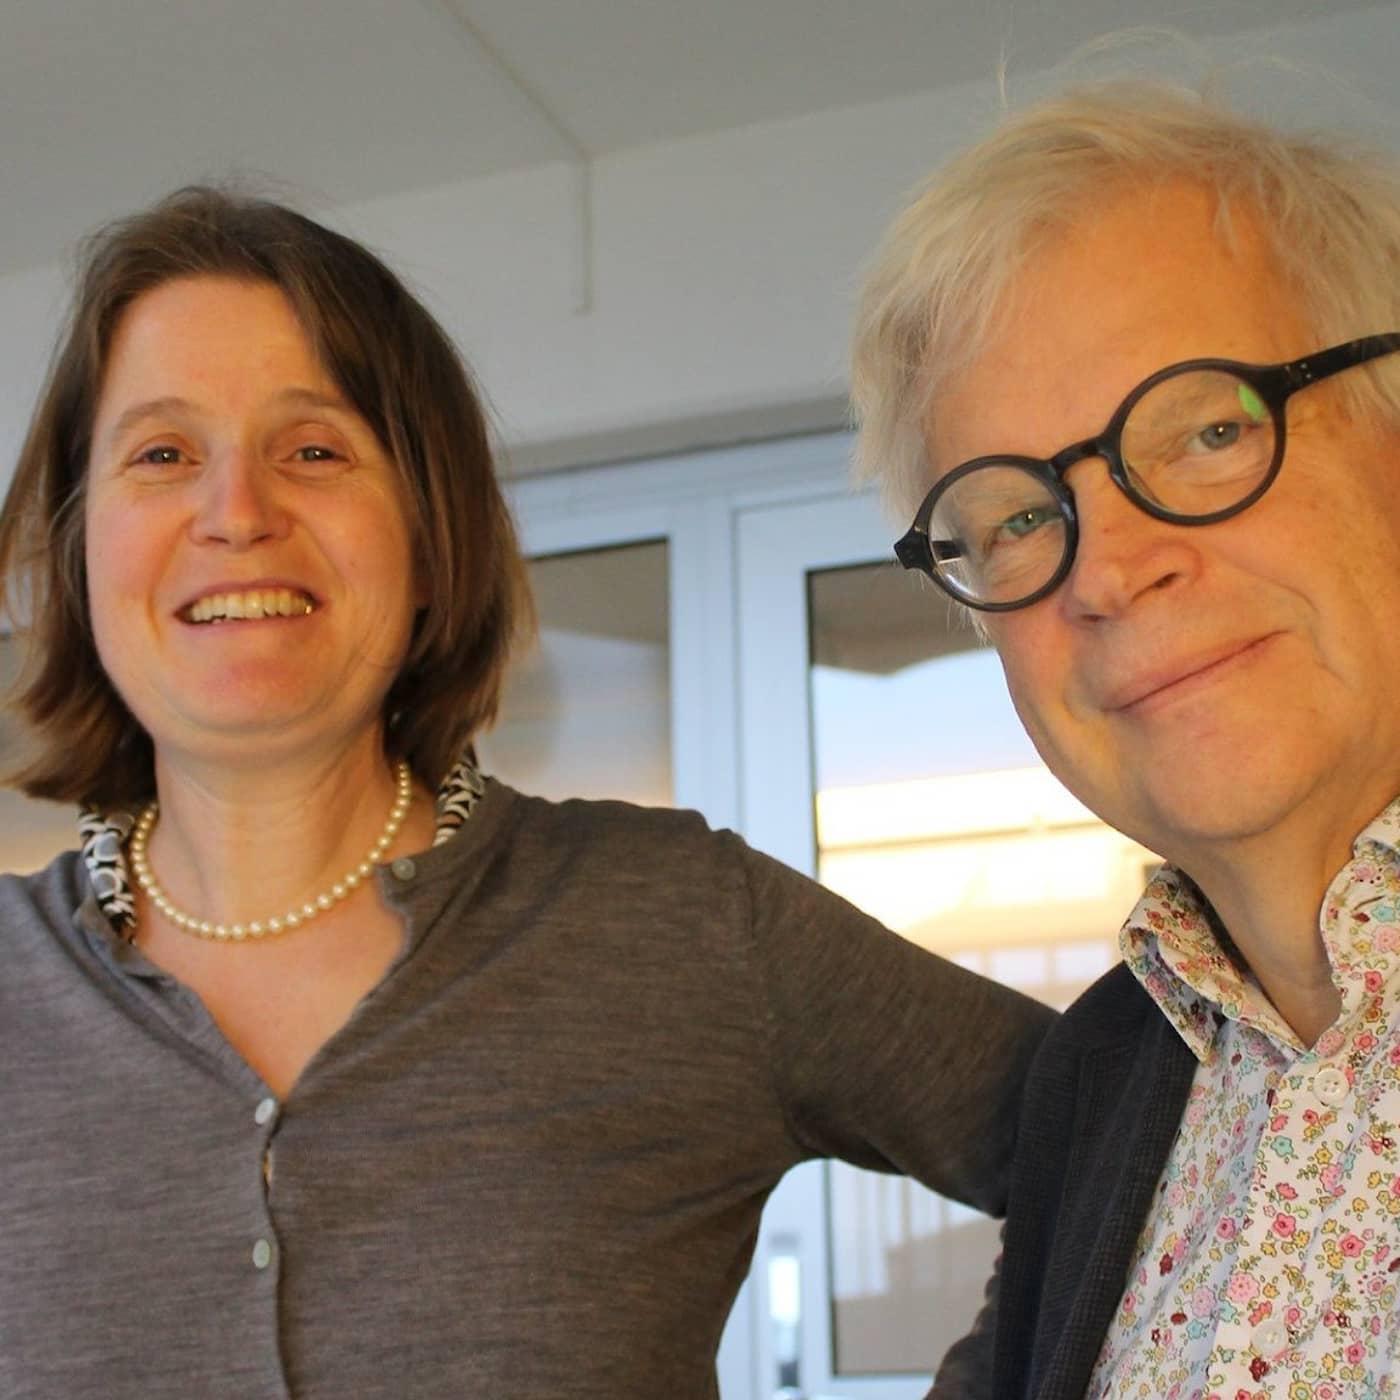 axberg dejt dating sweden hemse